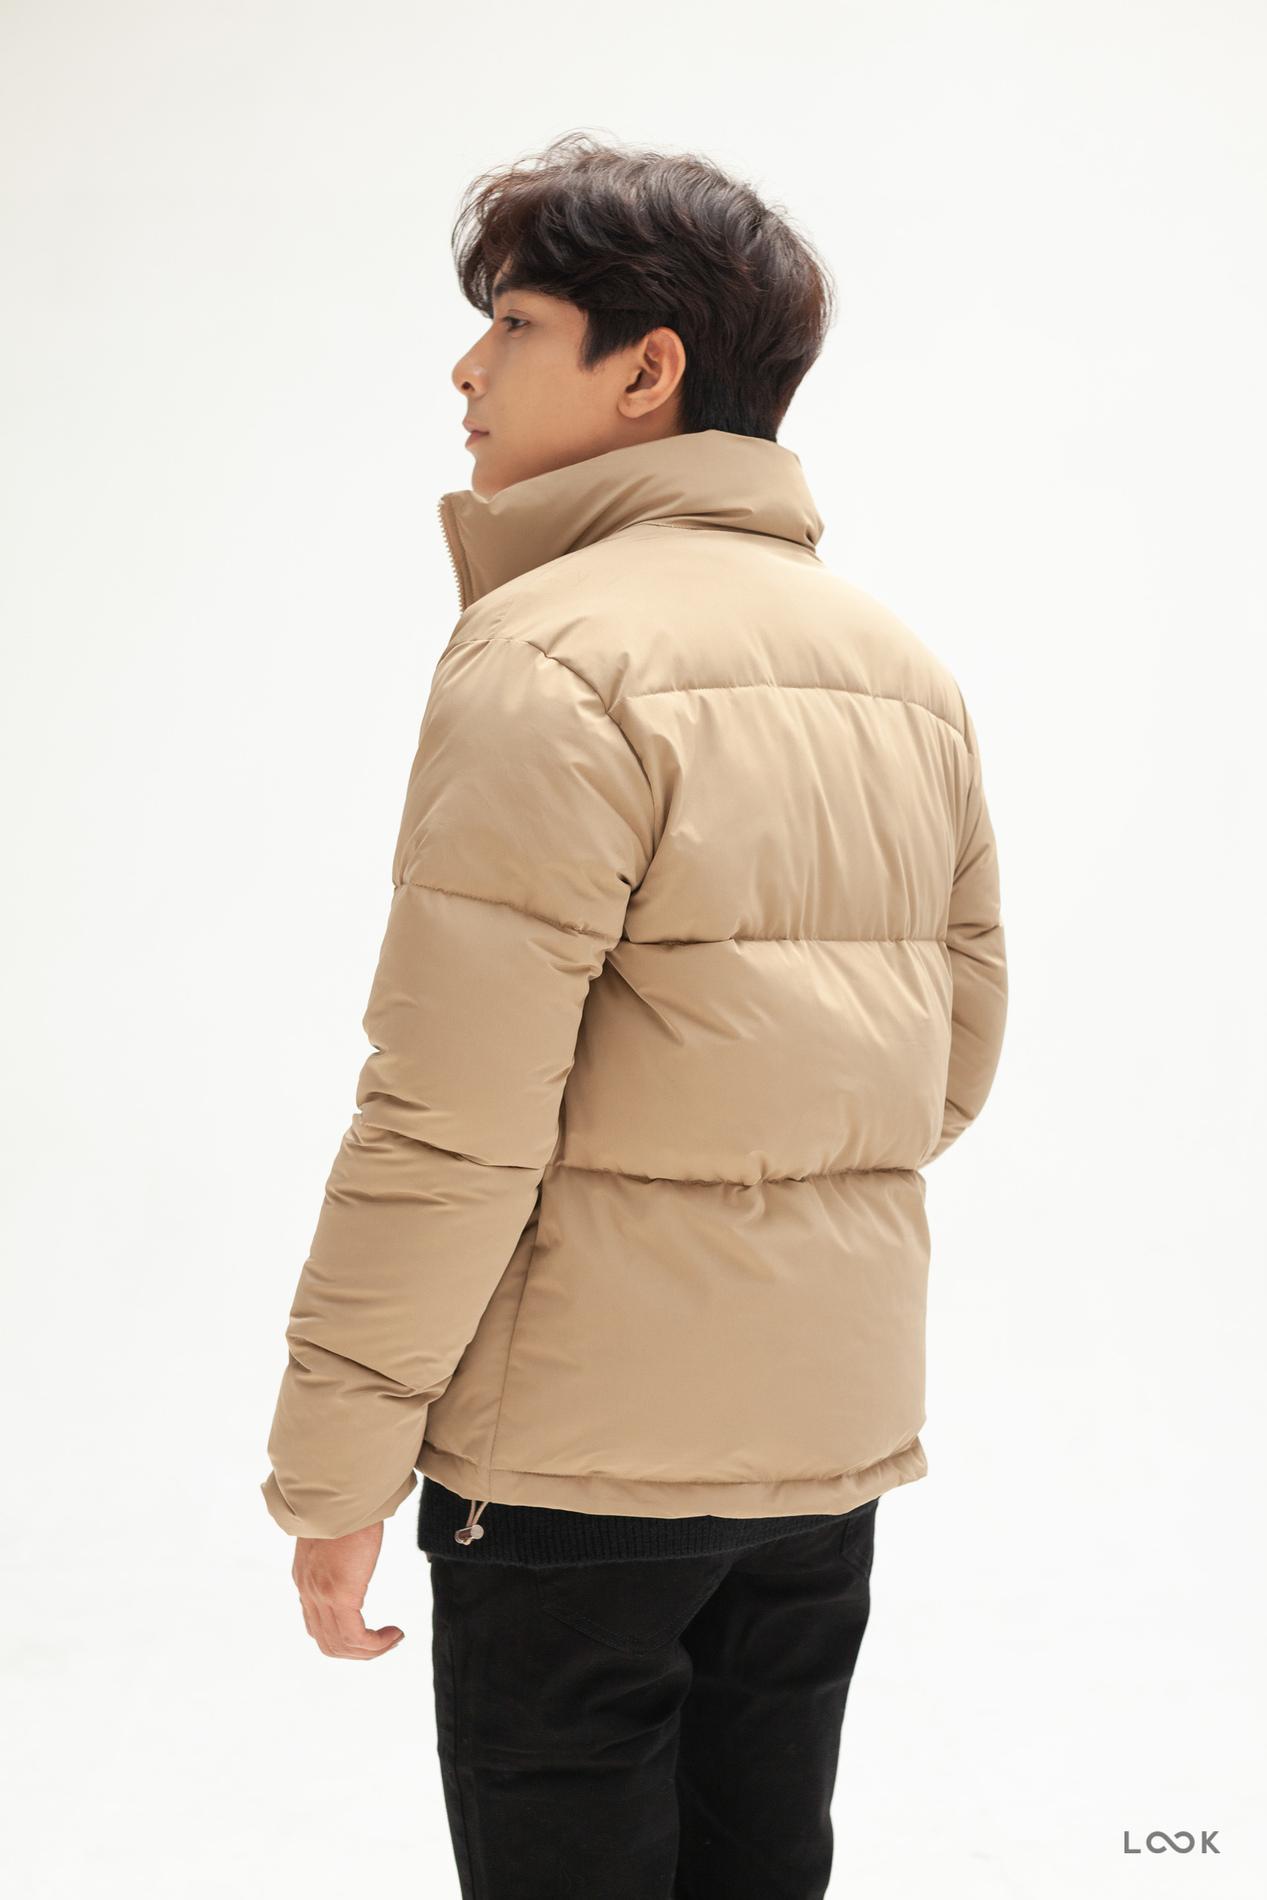 Look Puffy Jacket